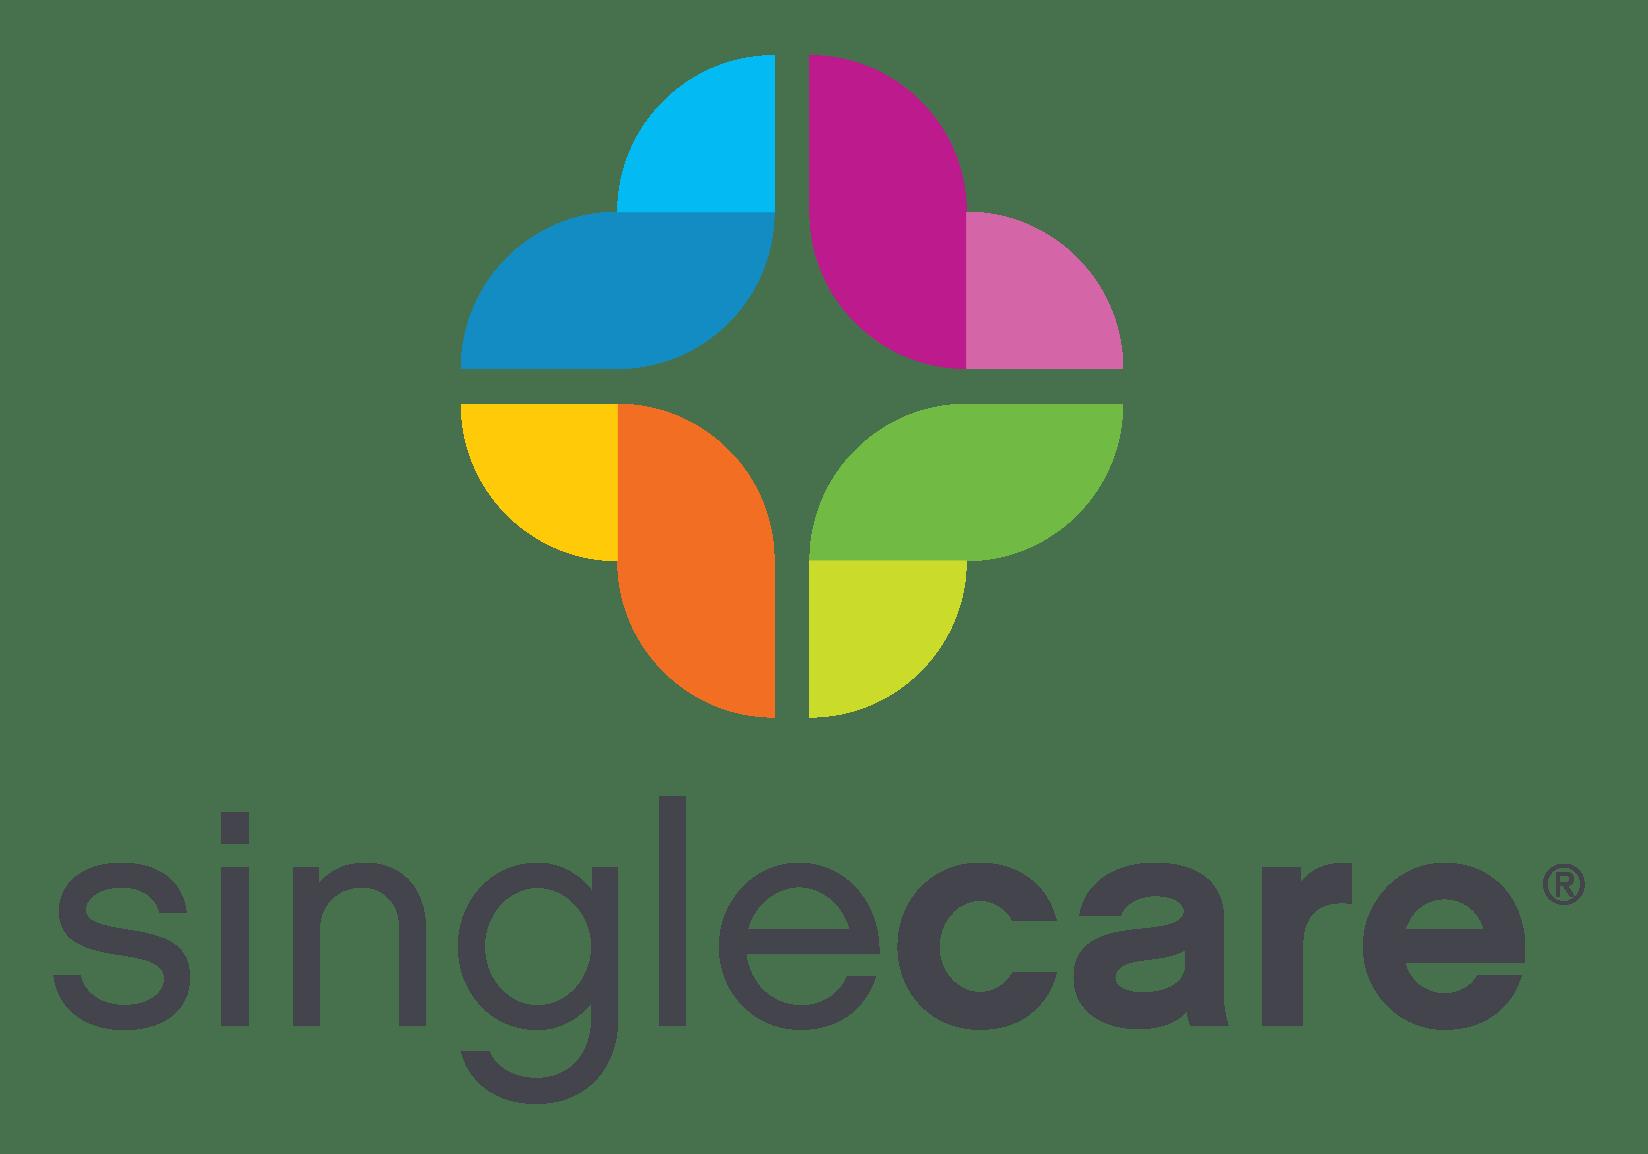 Healthcare alliance rxrelief - Healthcare Alliance Rxrelief 28